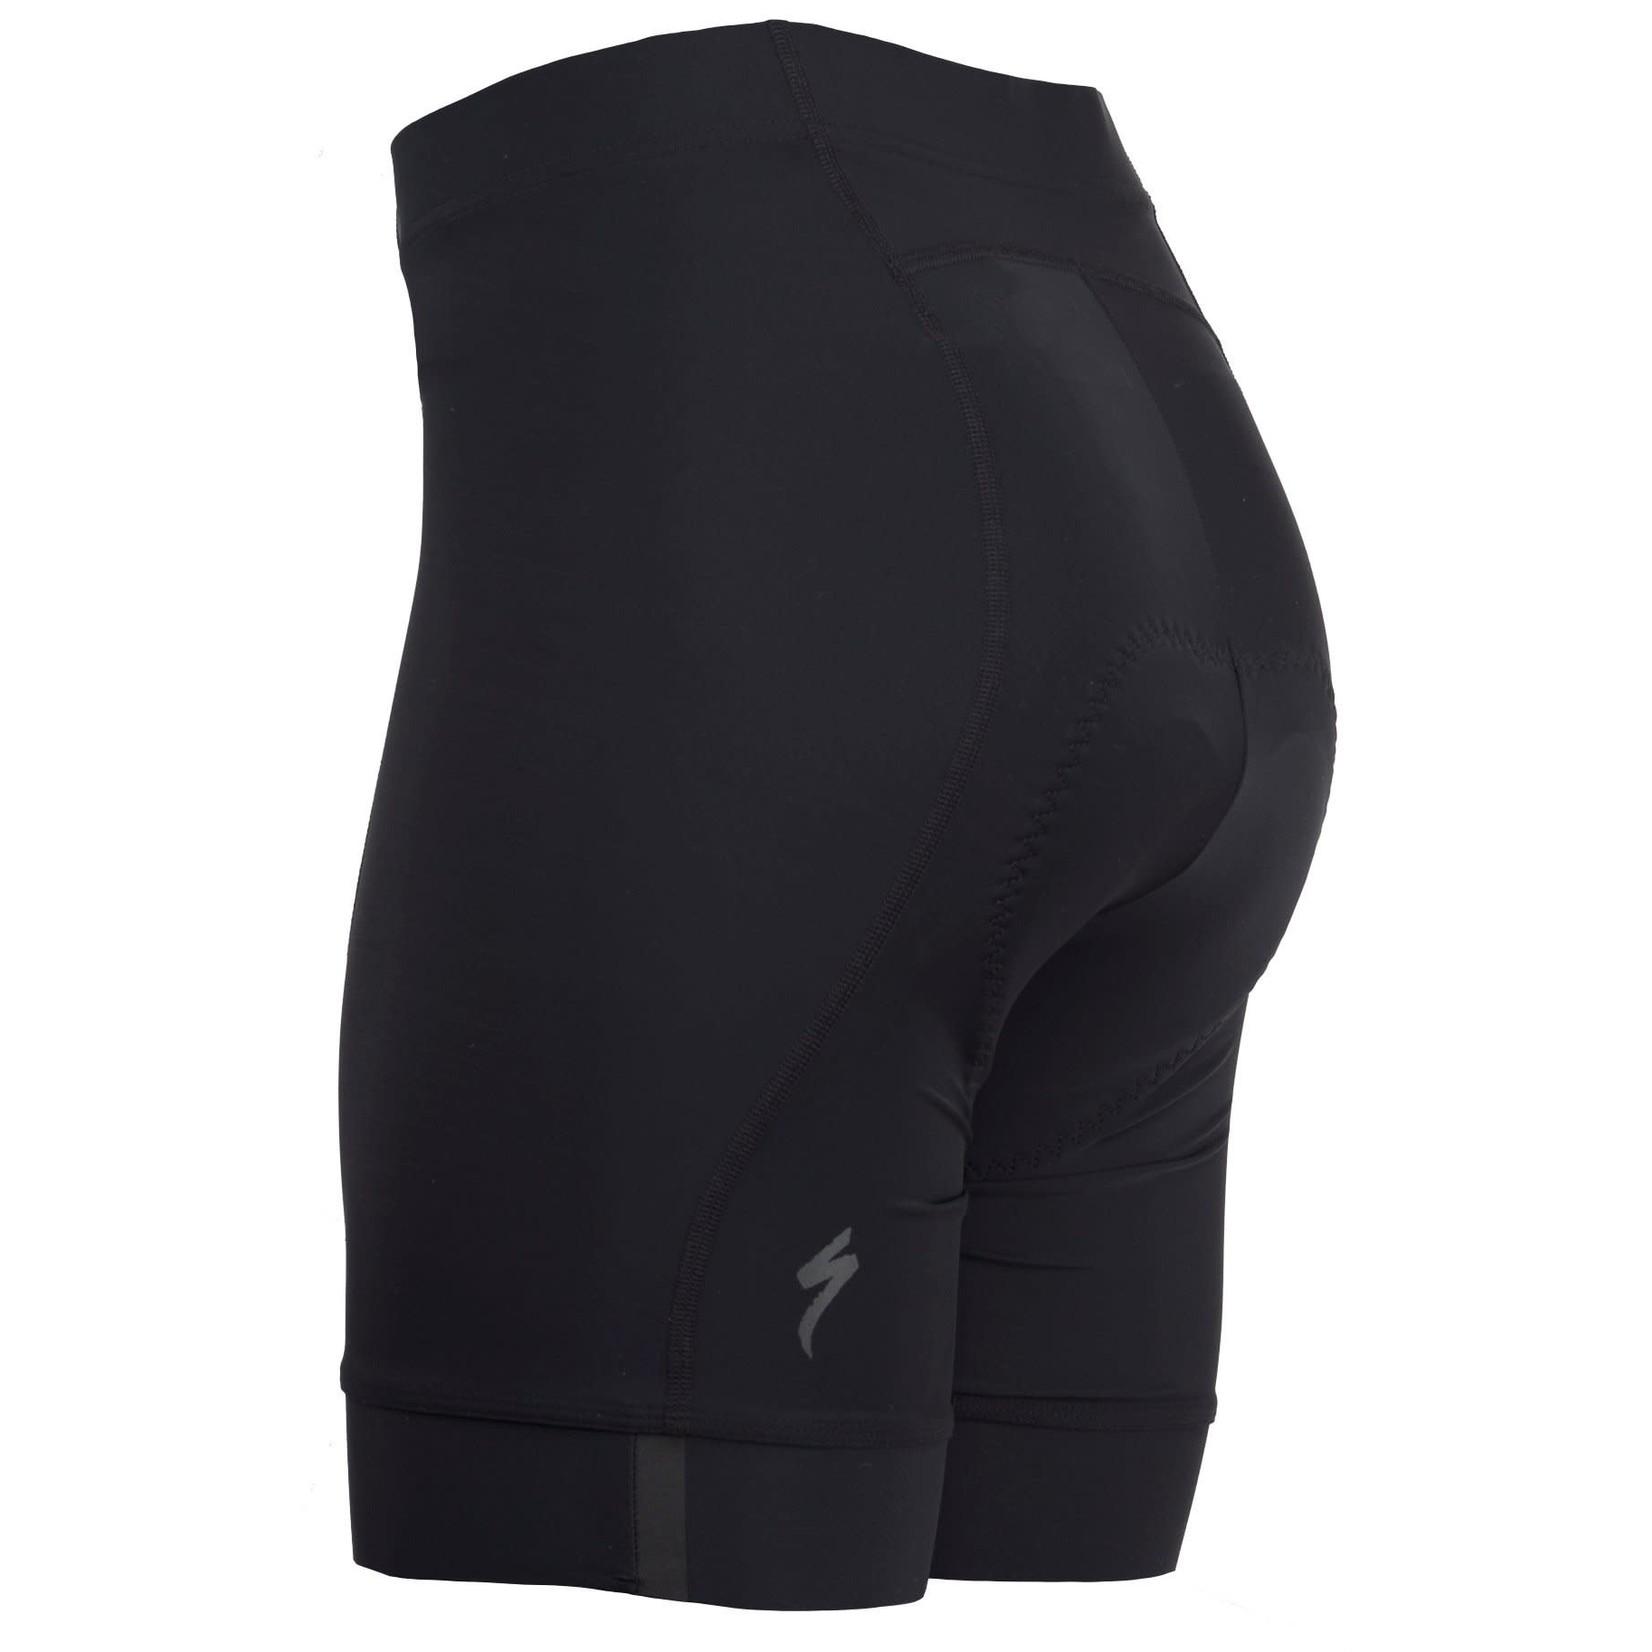 Specialized RBX WMNS Short Black X-Large